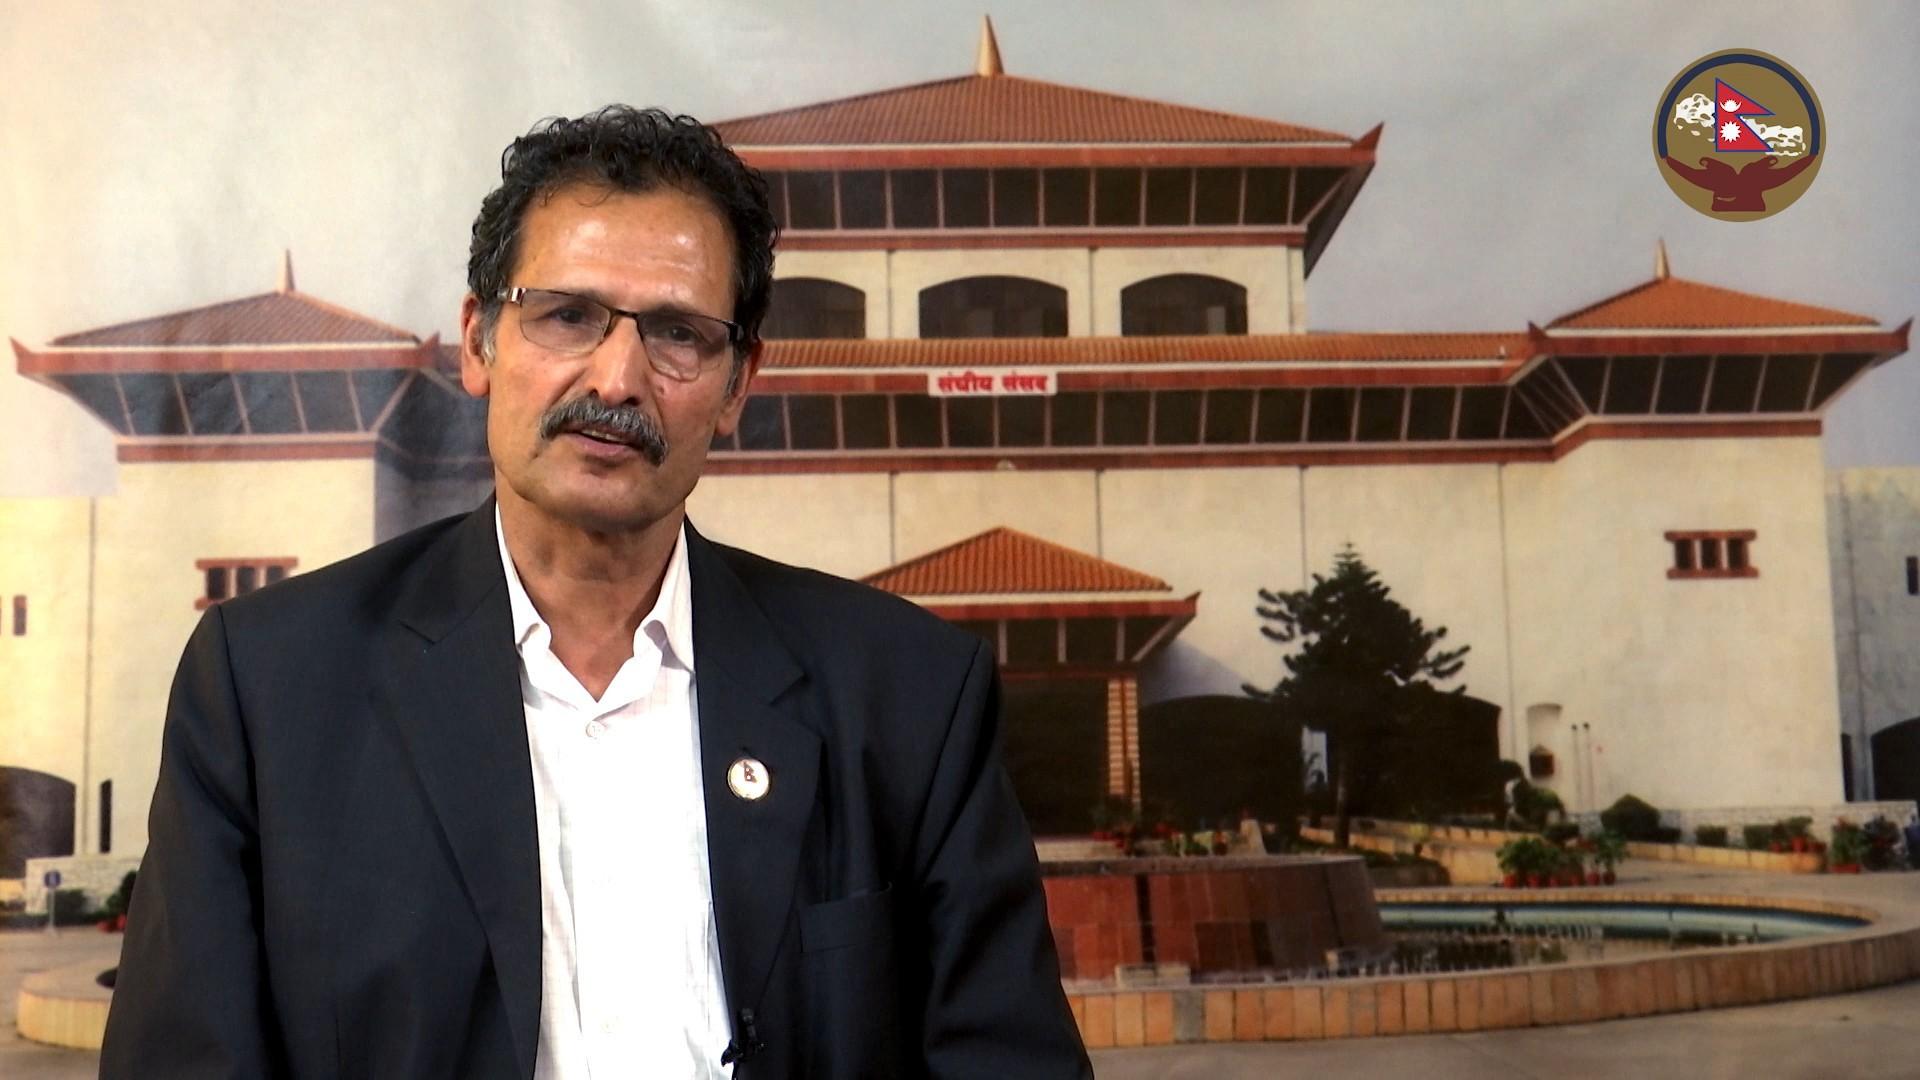 स्वास्थ्य सुरक्षाका सबै मापदण्ड पूरा : सभामुख सापकोटा